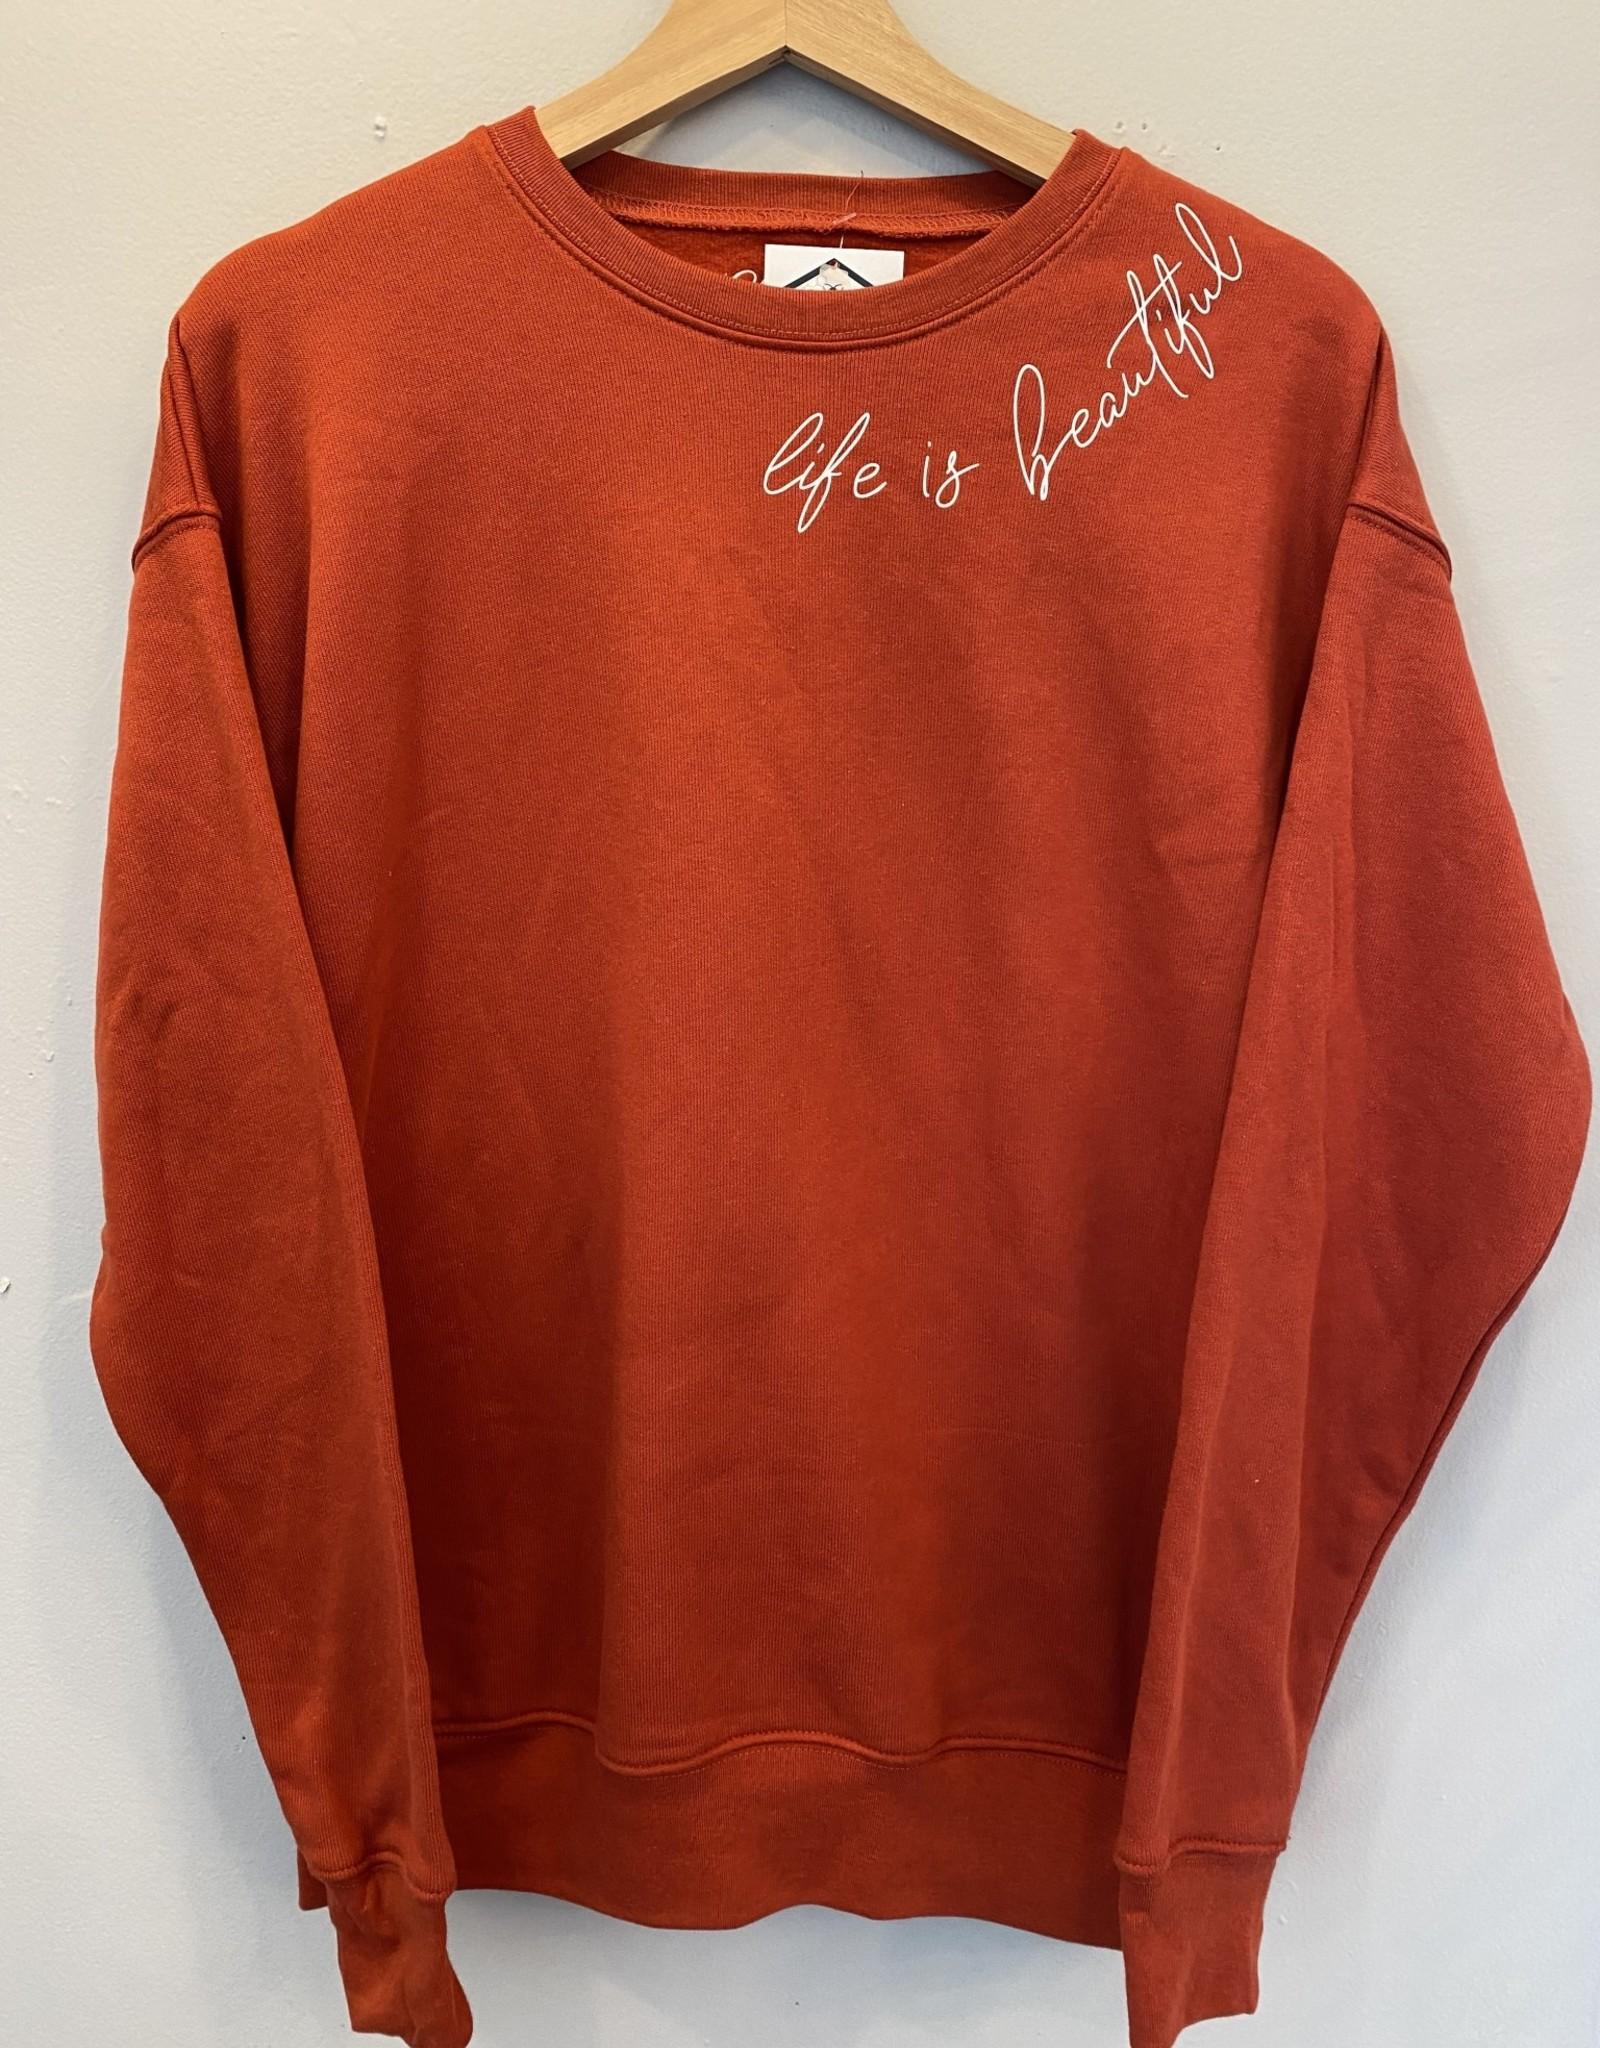 Wink Life is Beautiful Sweatshirt